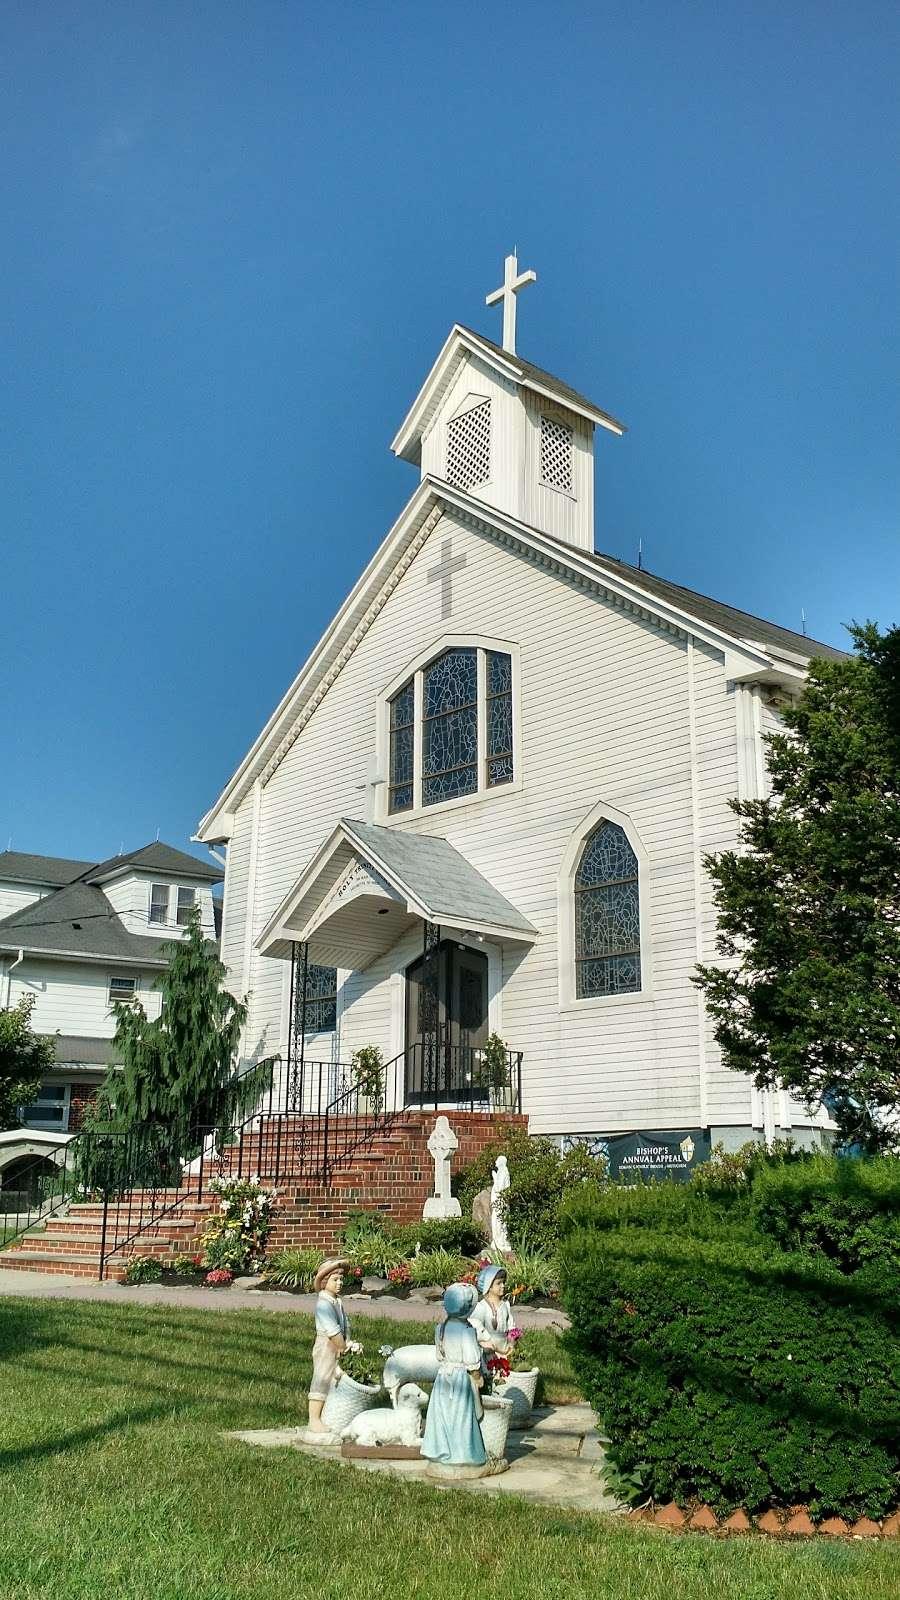 Holy Trinity Church - church  | Photo 1 of 6 | Address: 100 Main St, Helmetta, NJ 08828, USA | Phone: (732) 521-0172